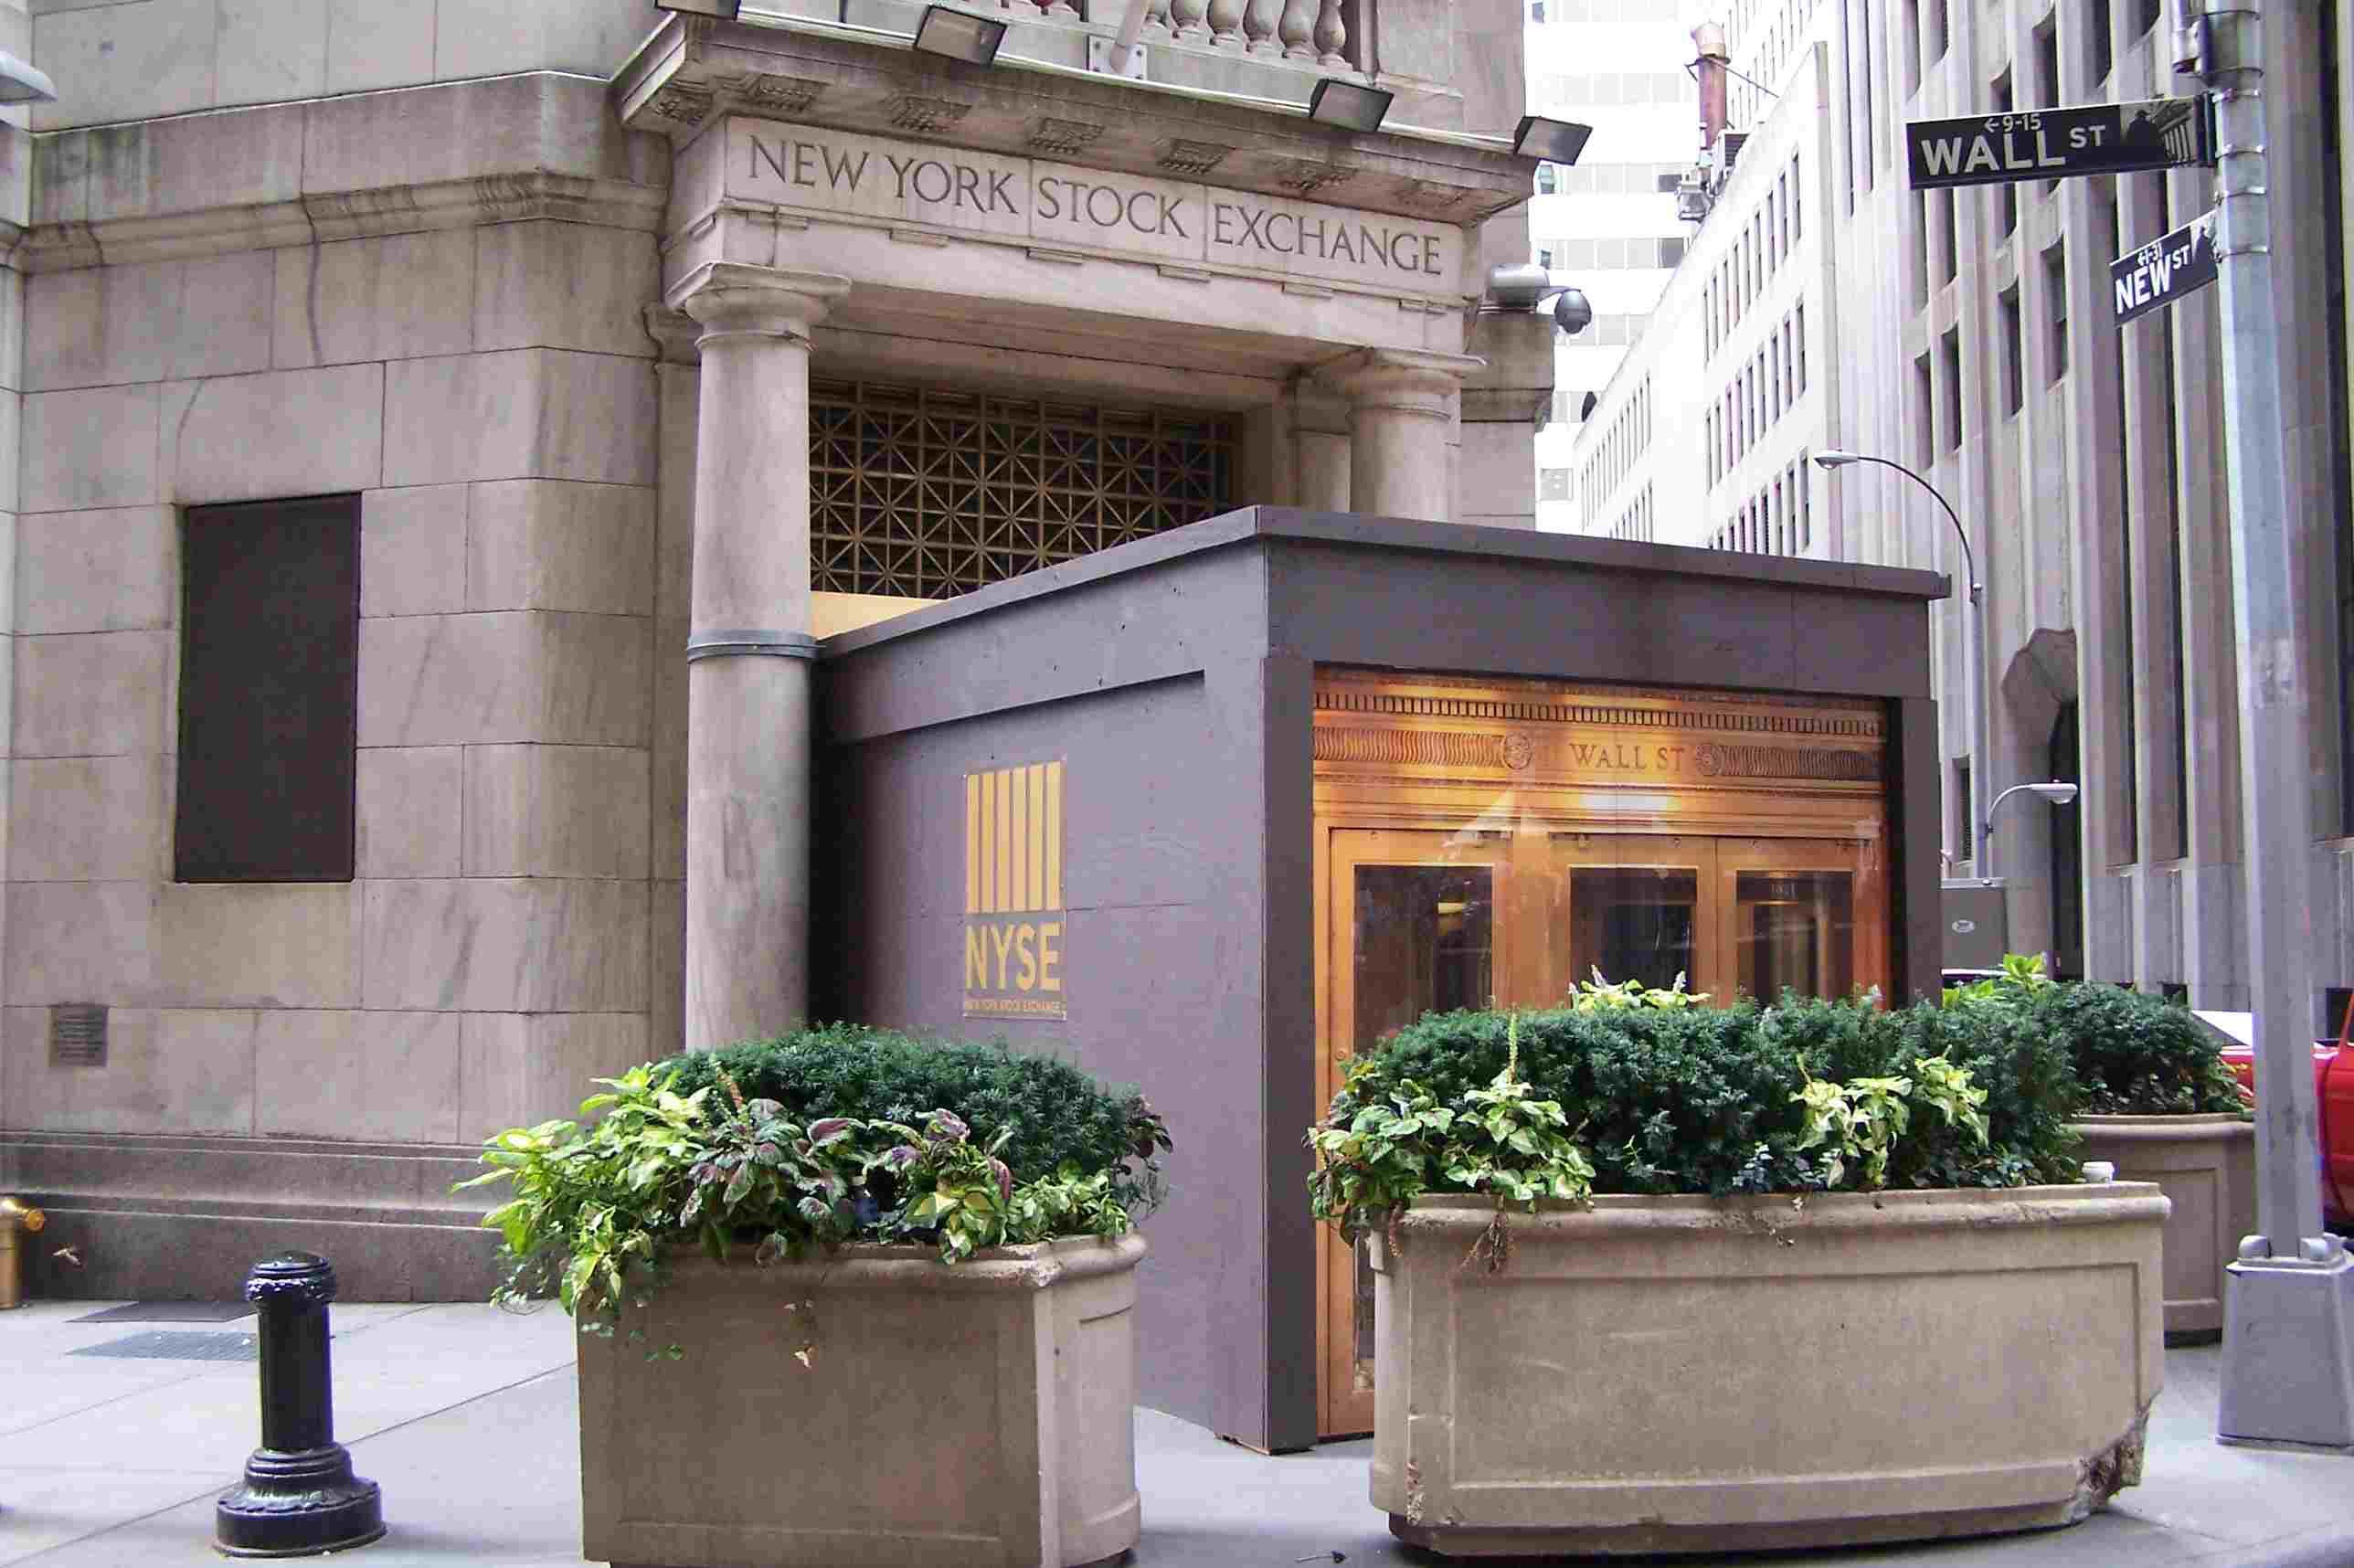 New York Stock Exchange Corporate Headquarters, 11 Wall Street, corner of New Street